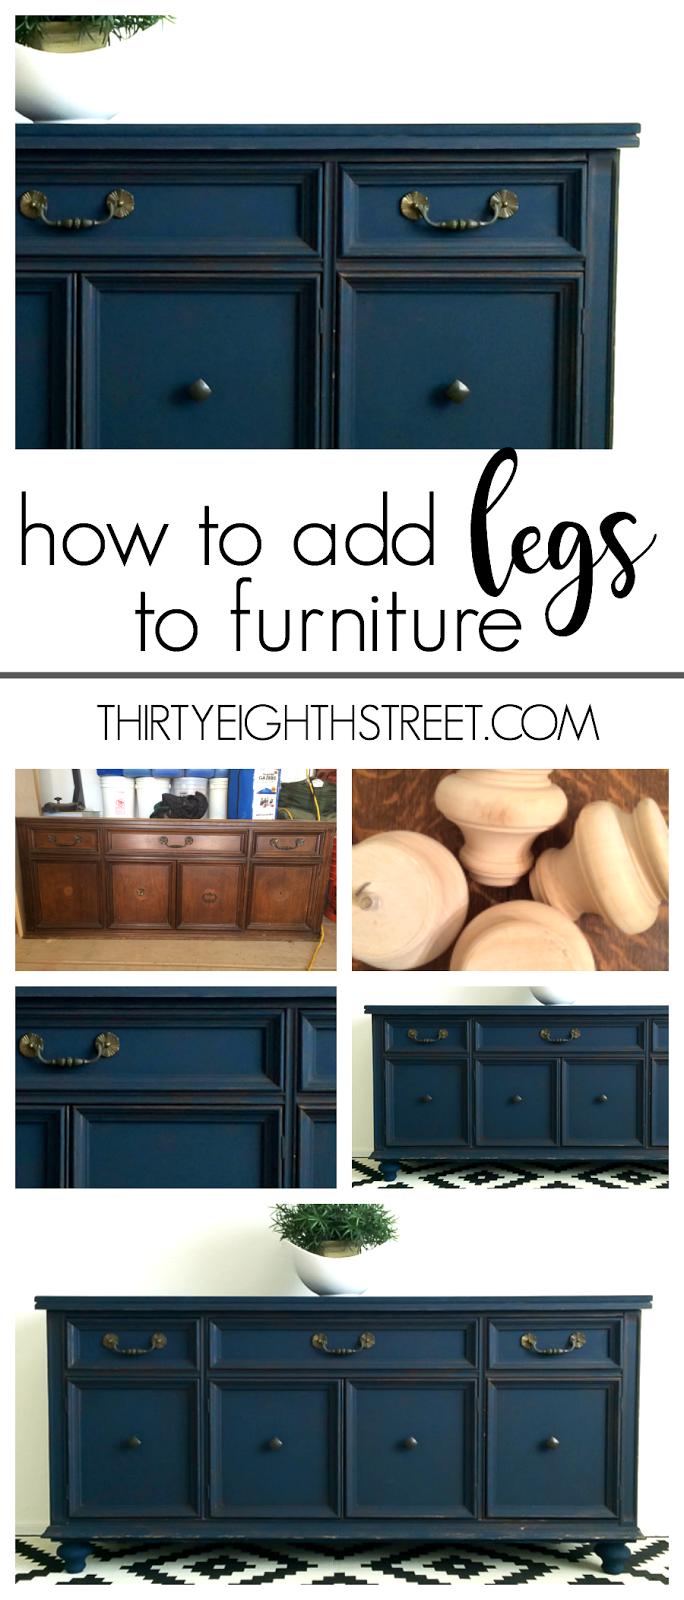 23+ Adding feet to a dresser ideas in 2021